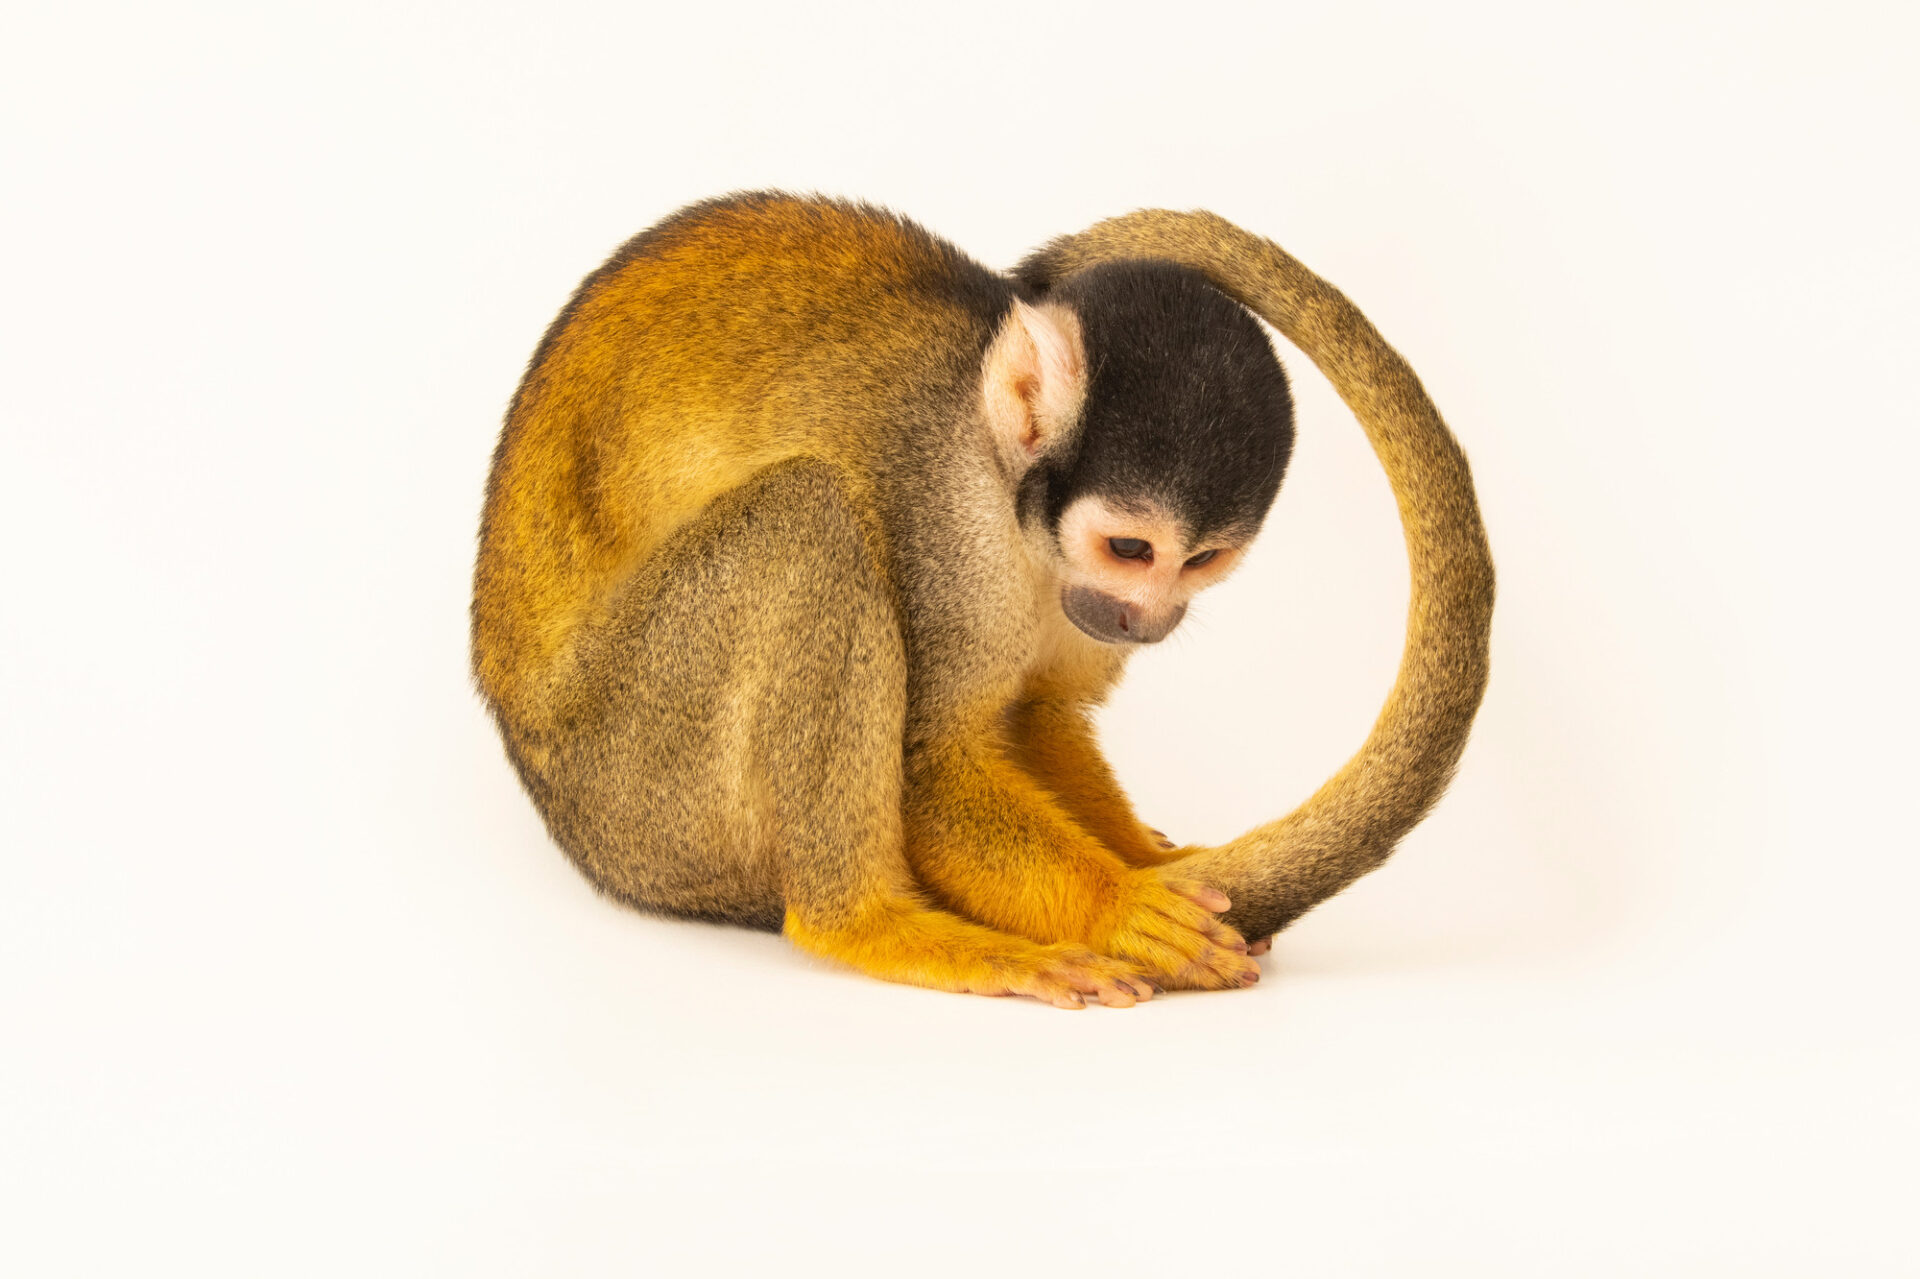 Photo: A bare-eared squirrel monkey (Saimiri ustus) at BioParque do Rio.